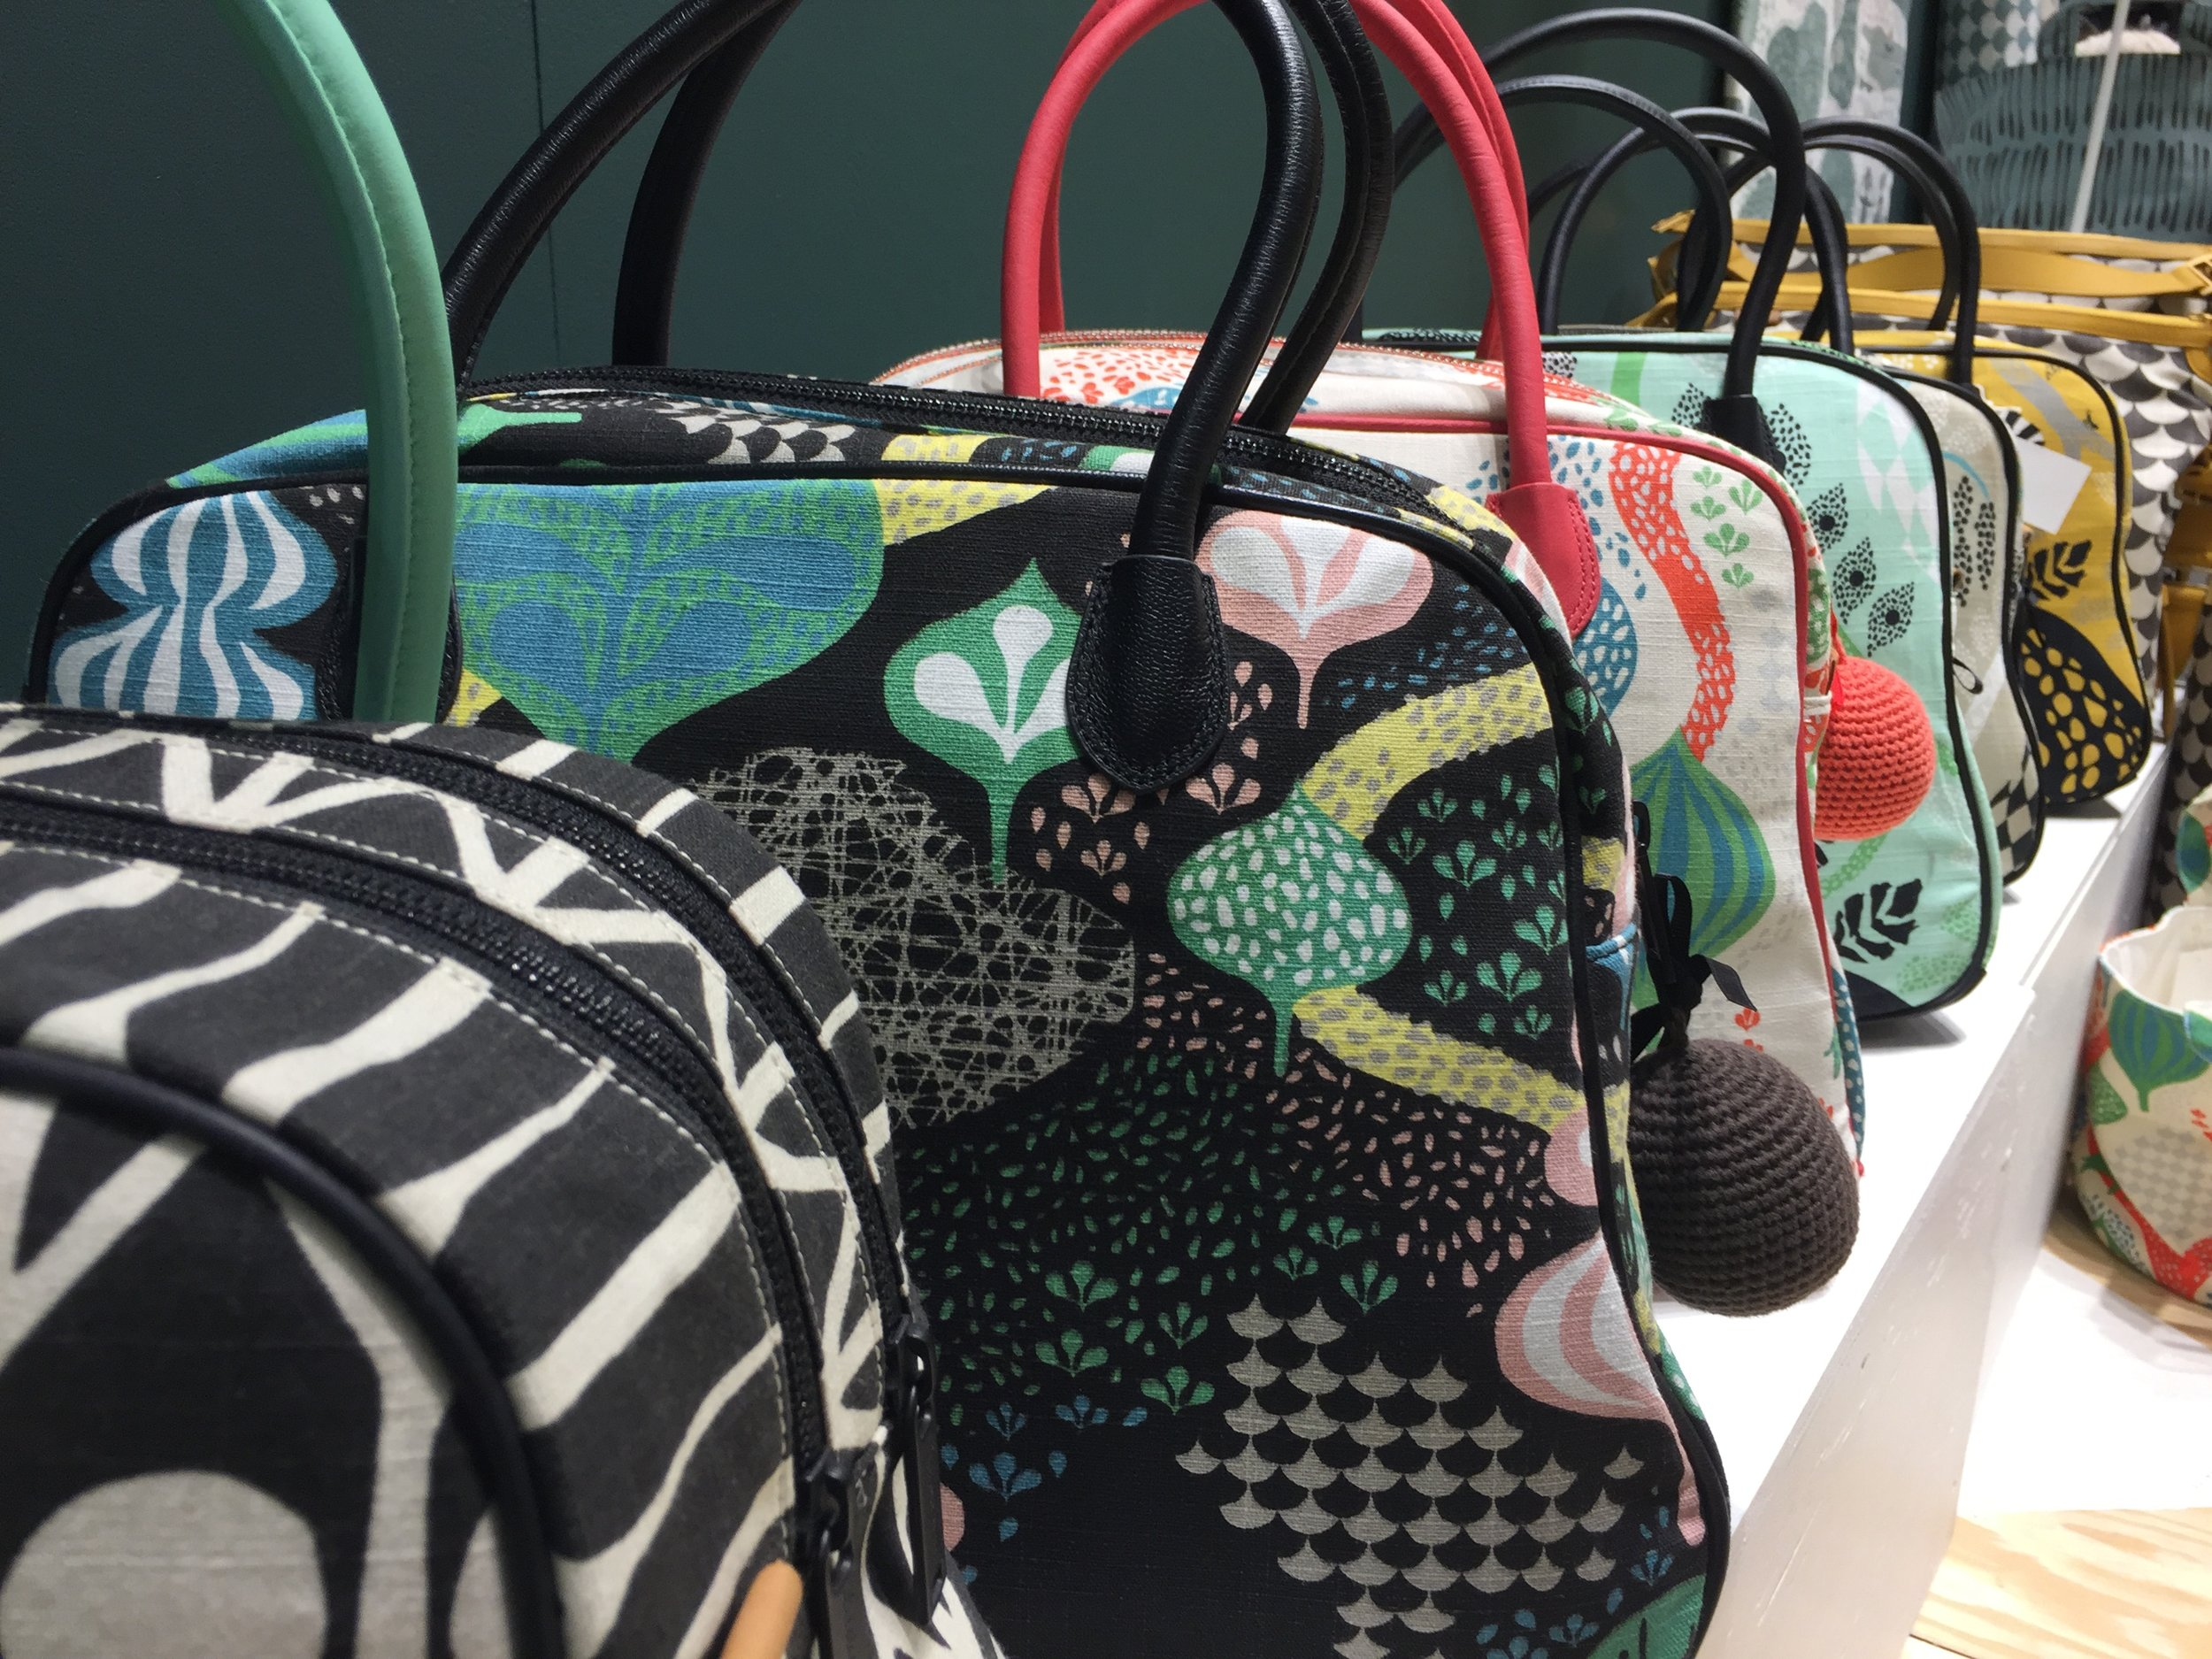 Cute bags at Littlephant